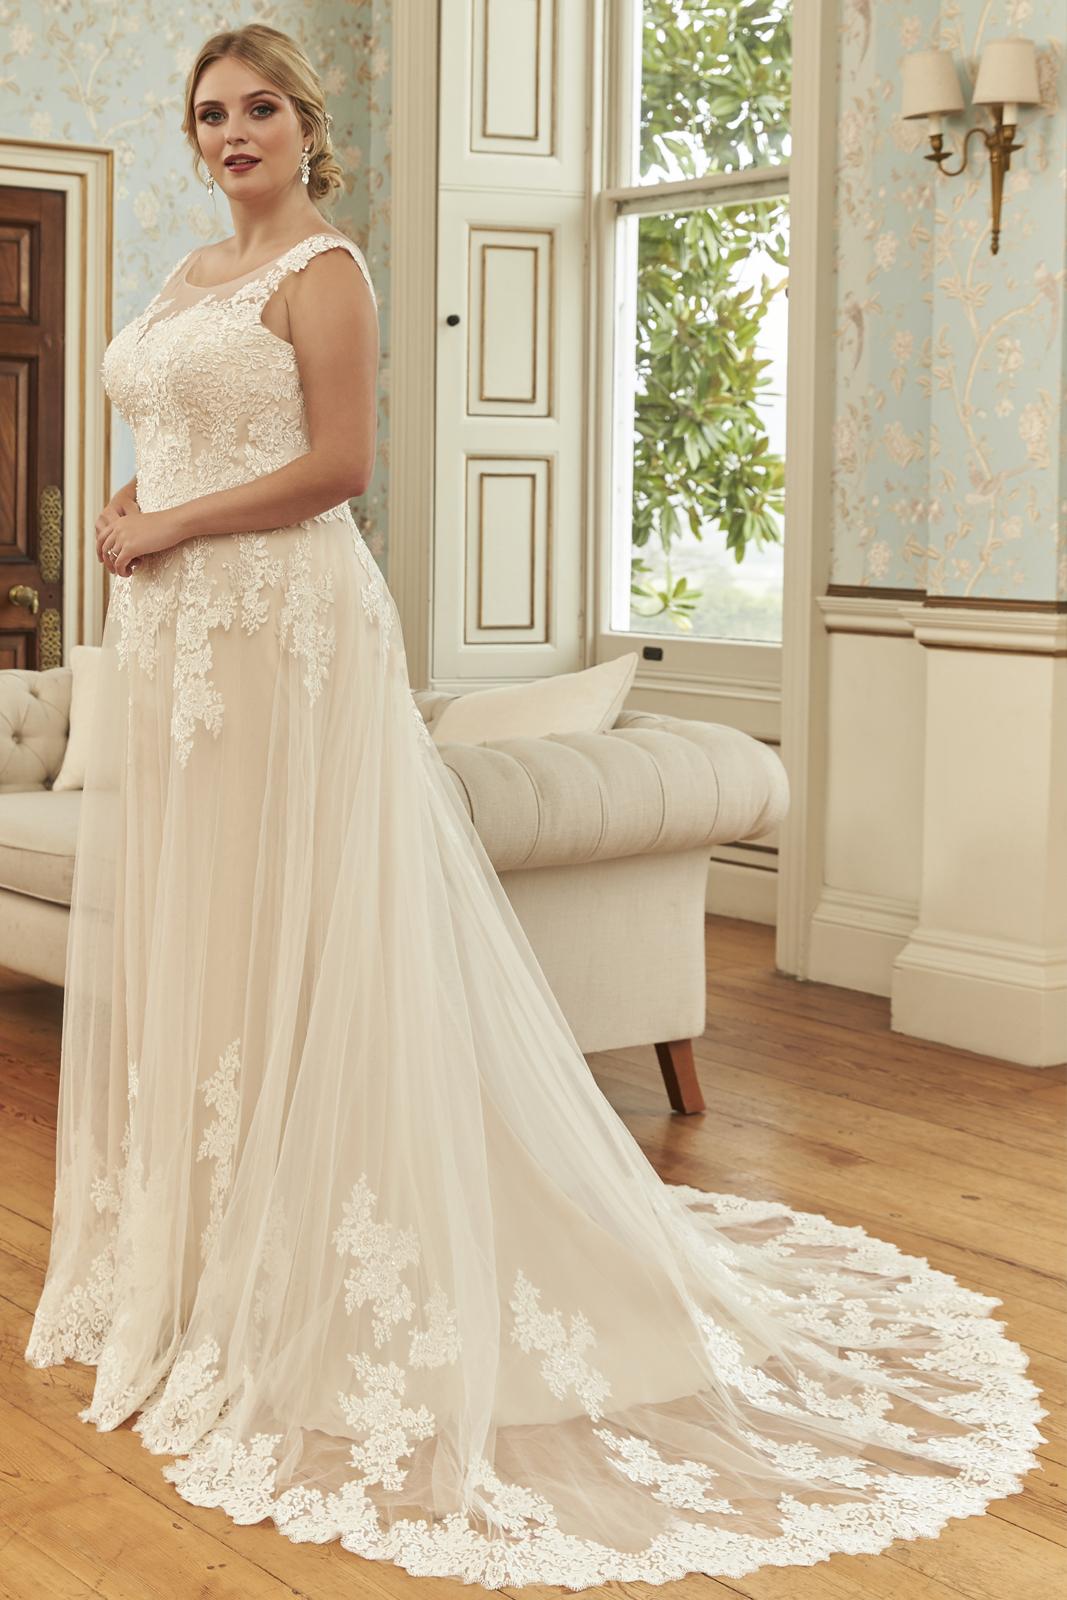 Bridal Emporium   Brisbane Bridal Gowns and Wedding